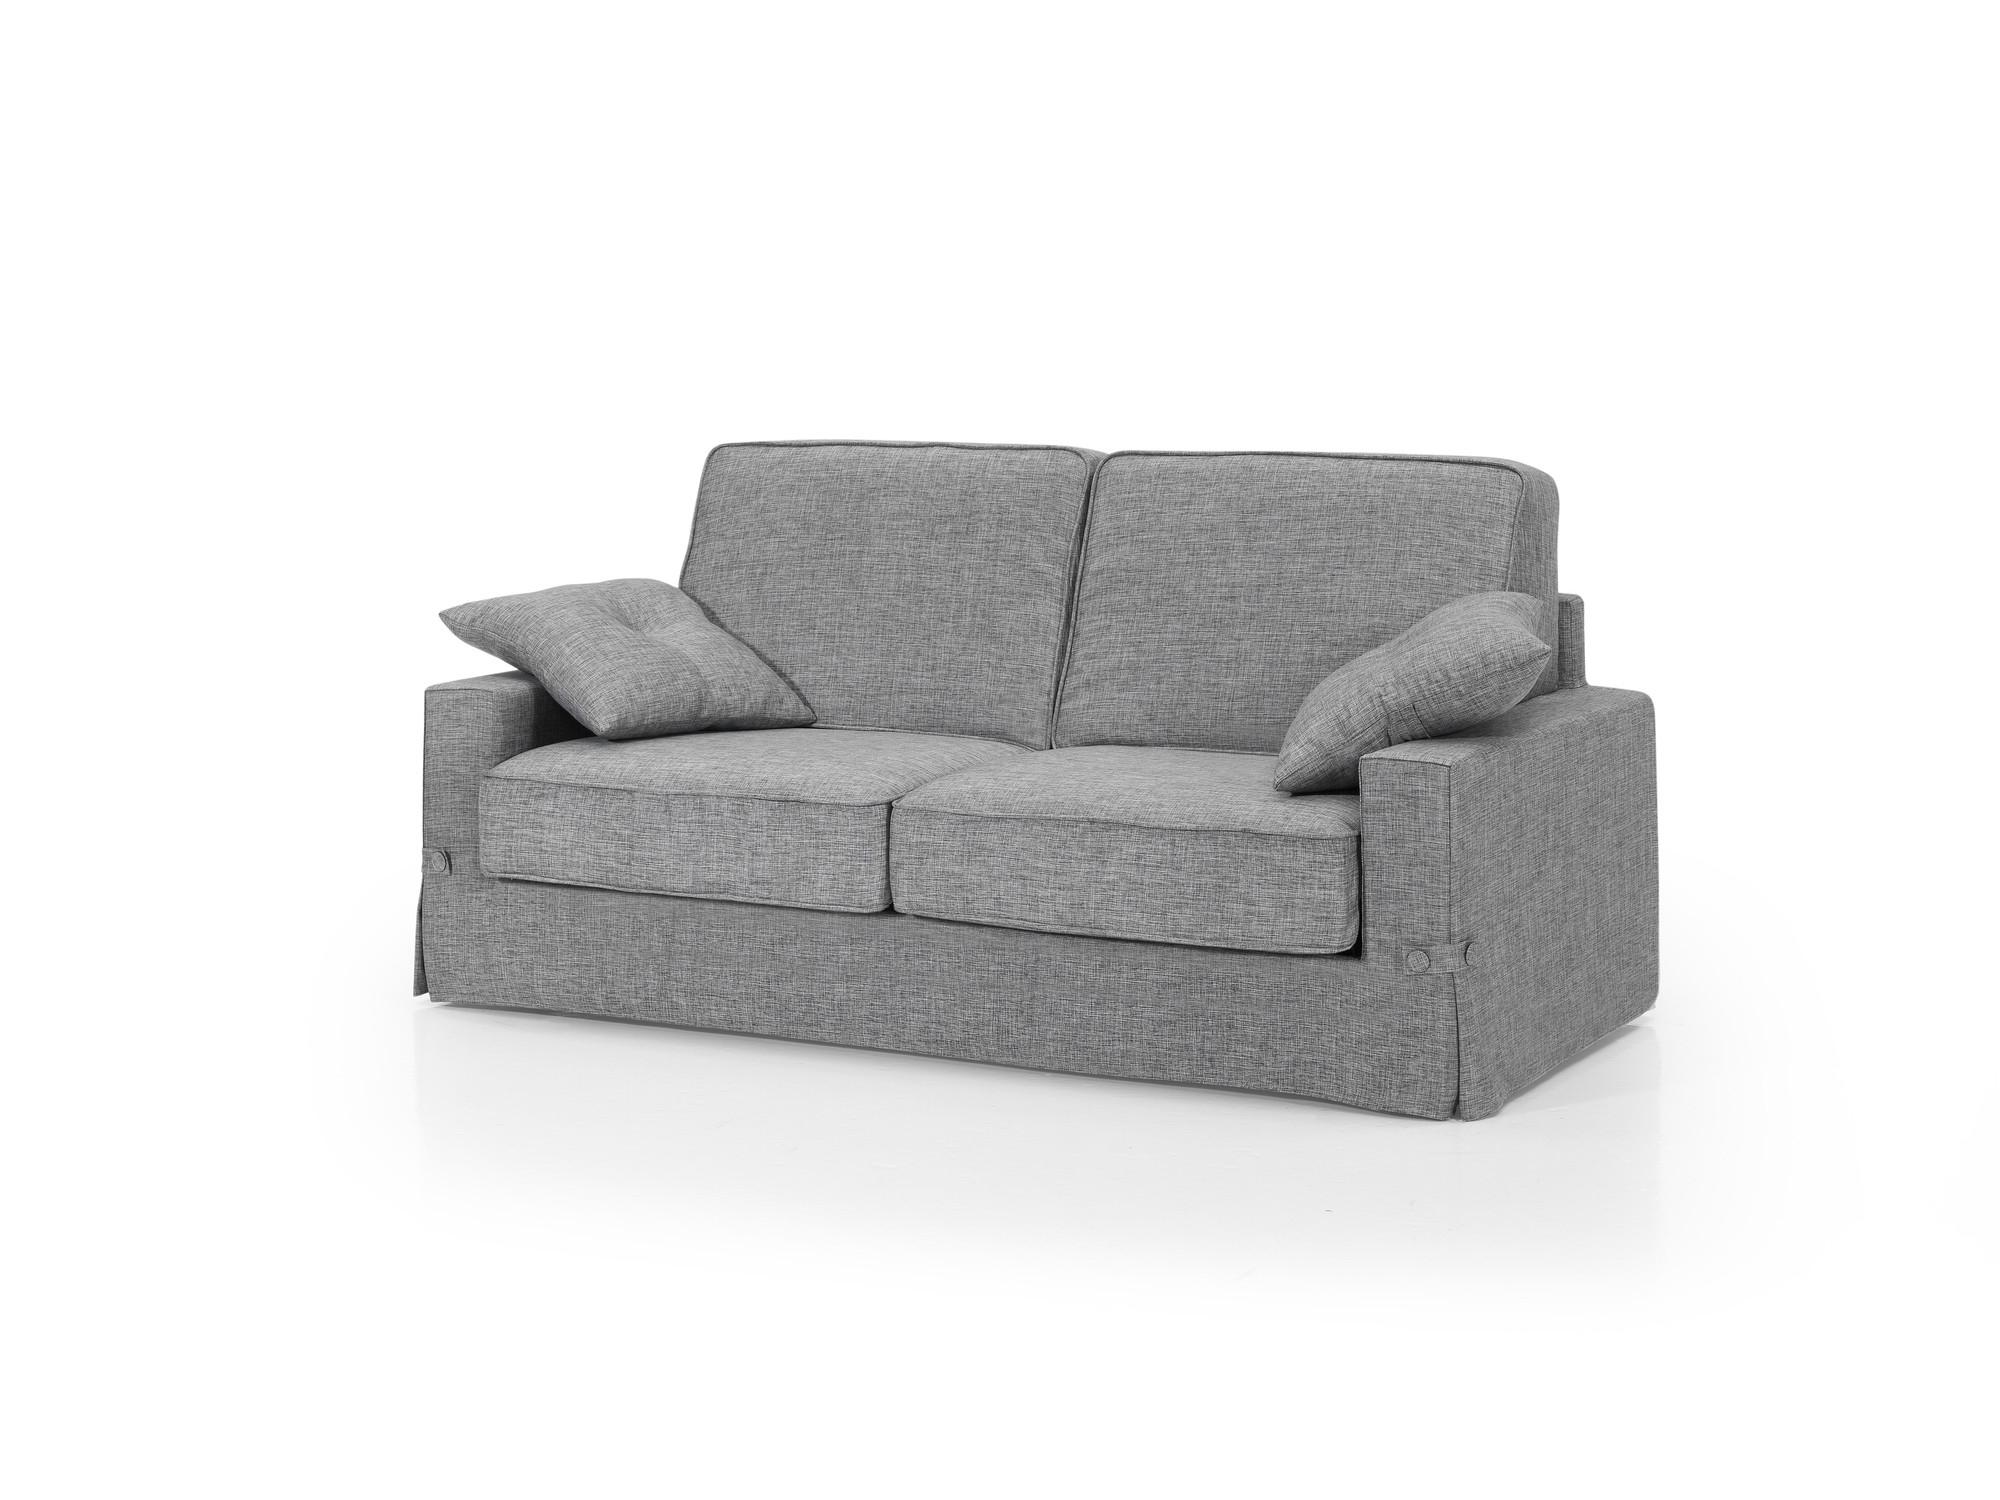 Sofa Cama Online Gdd0 sofas Online Baratos Que Se Adaptan A Cualquier Decoracià N Y Salà N